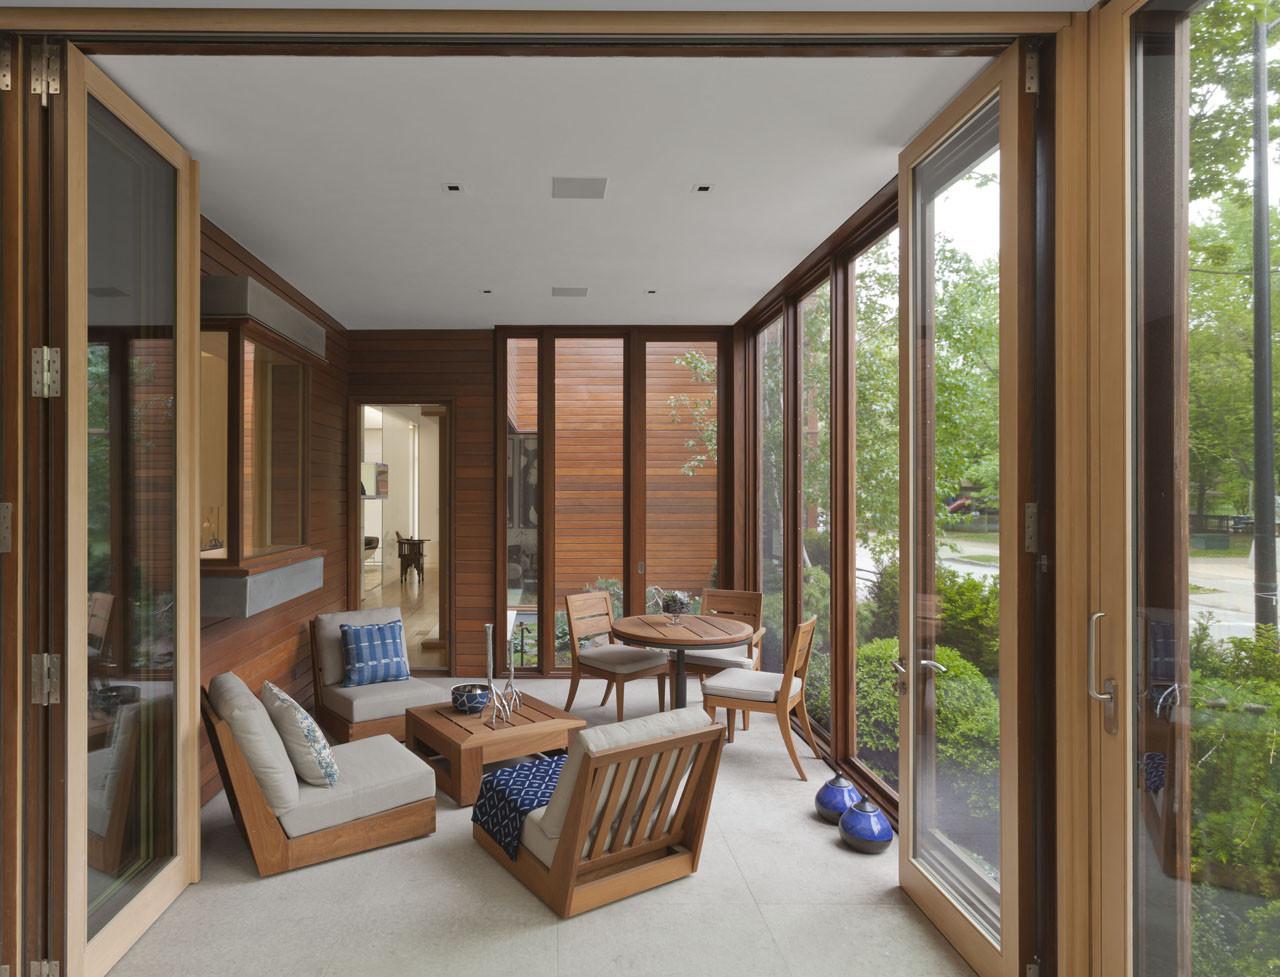 Chicago Residence / Dirk Denison Architects